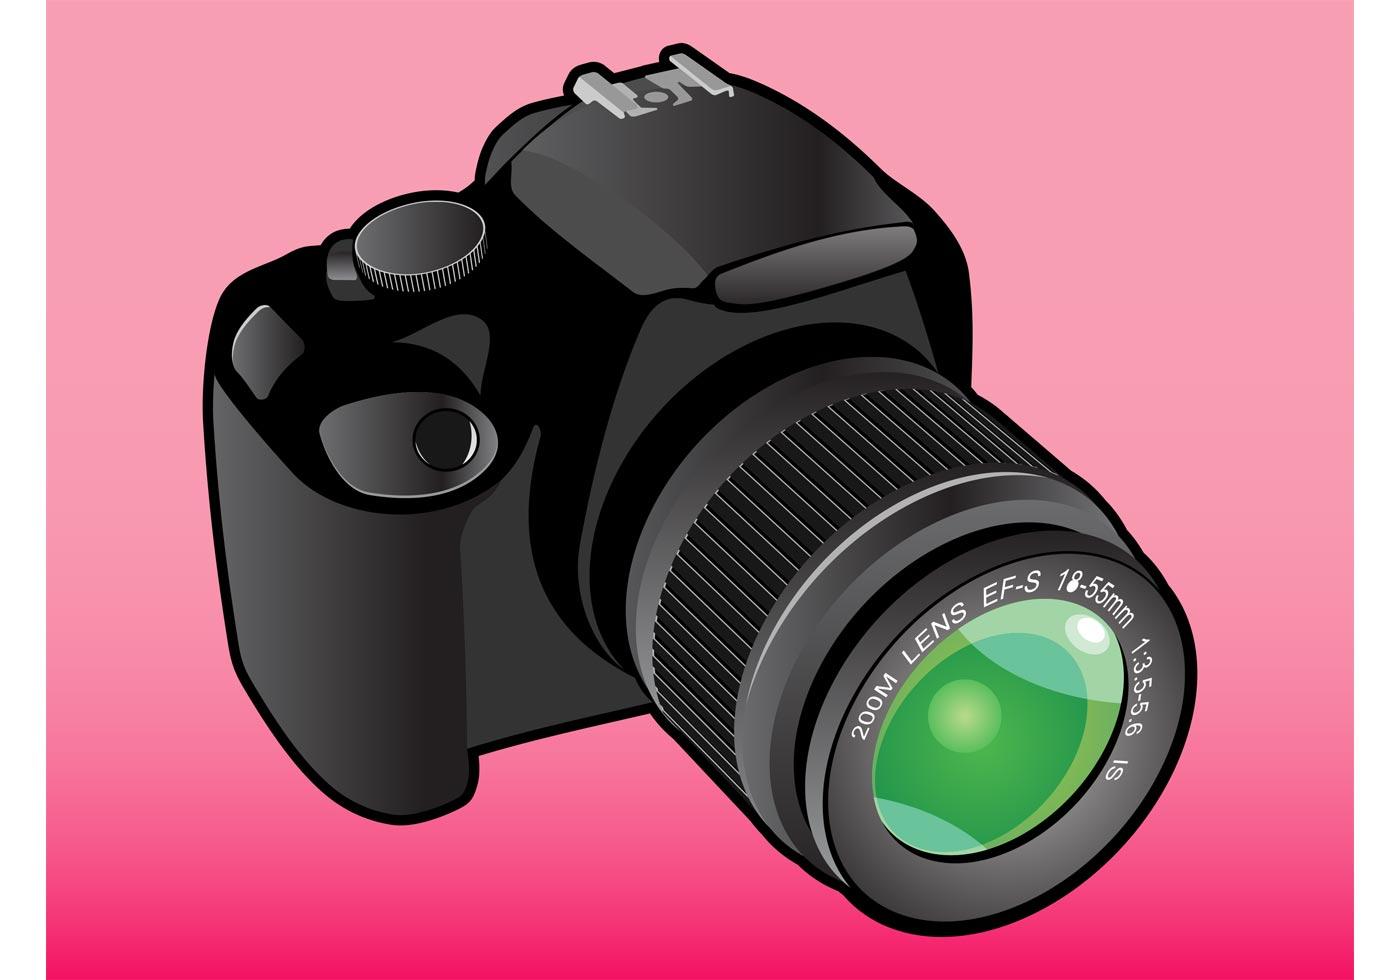 1400x980 Dslr Camera Free Vector Art